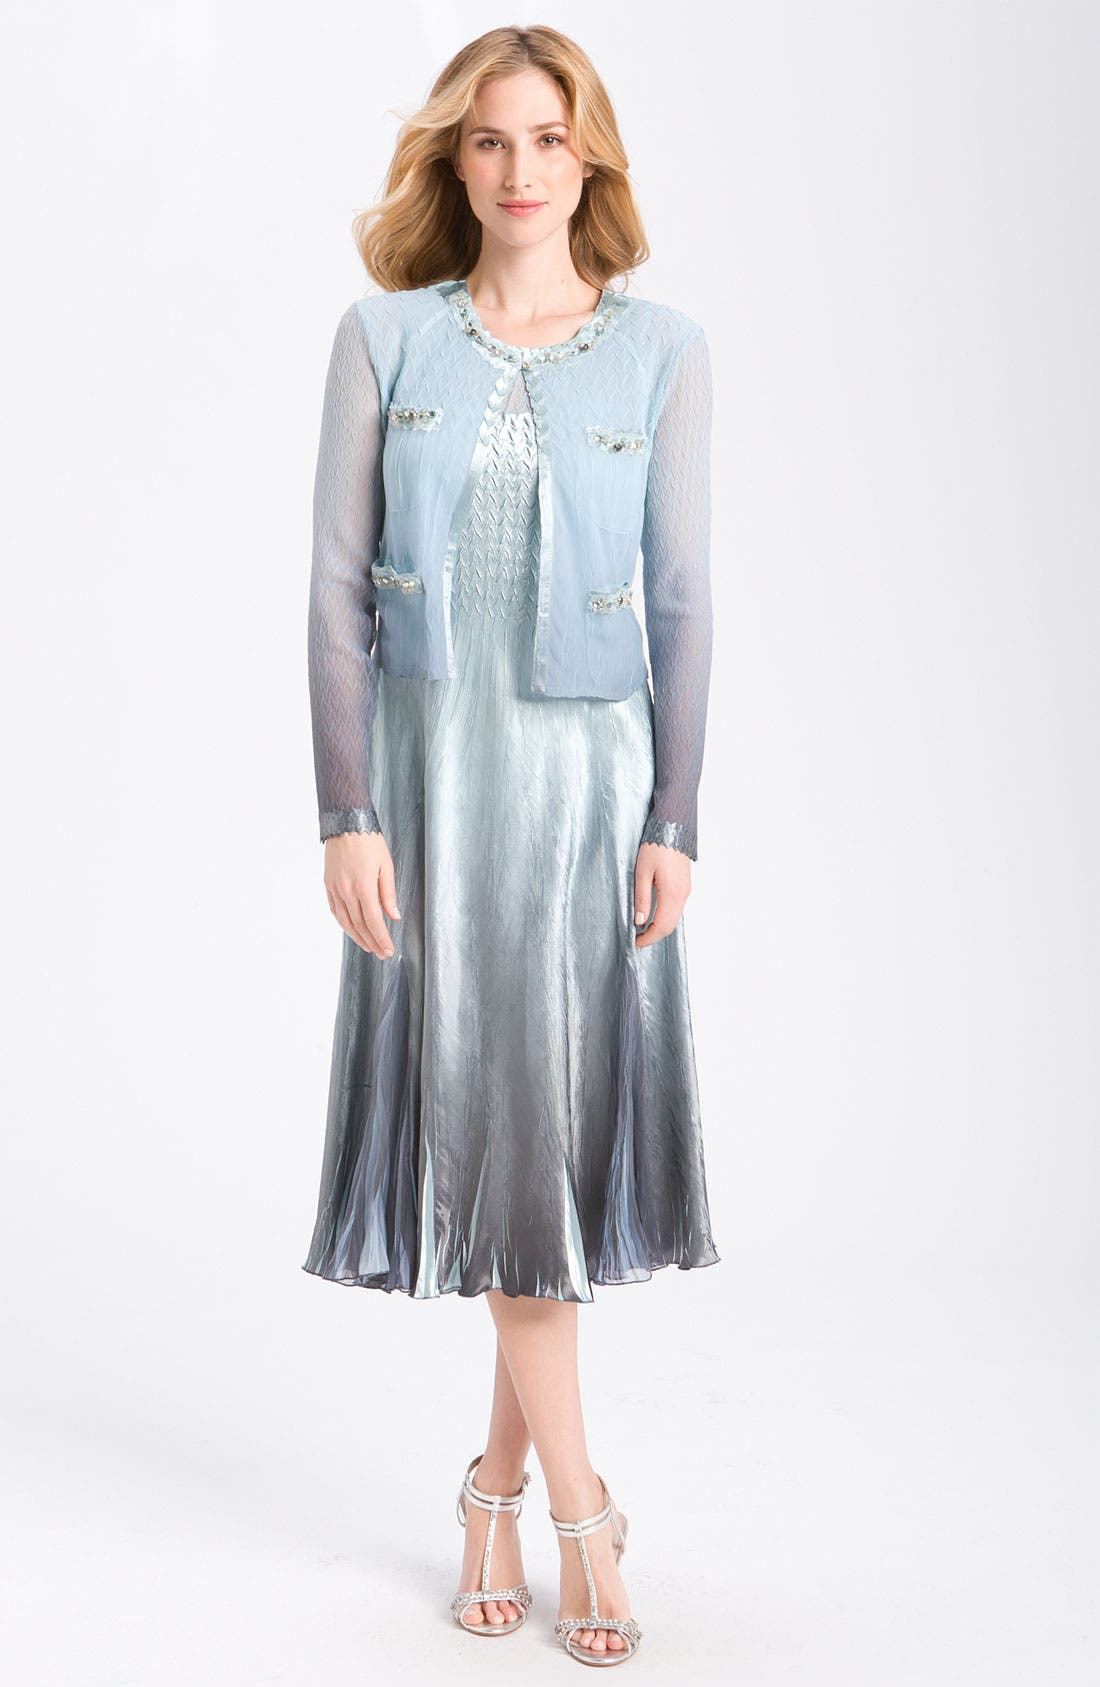 Alternate Image 1 Selected - Komarov Sleeveless Chiffon Dress & Jacket